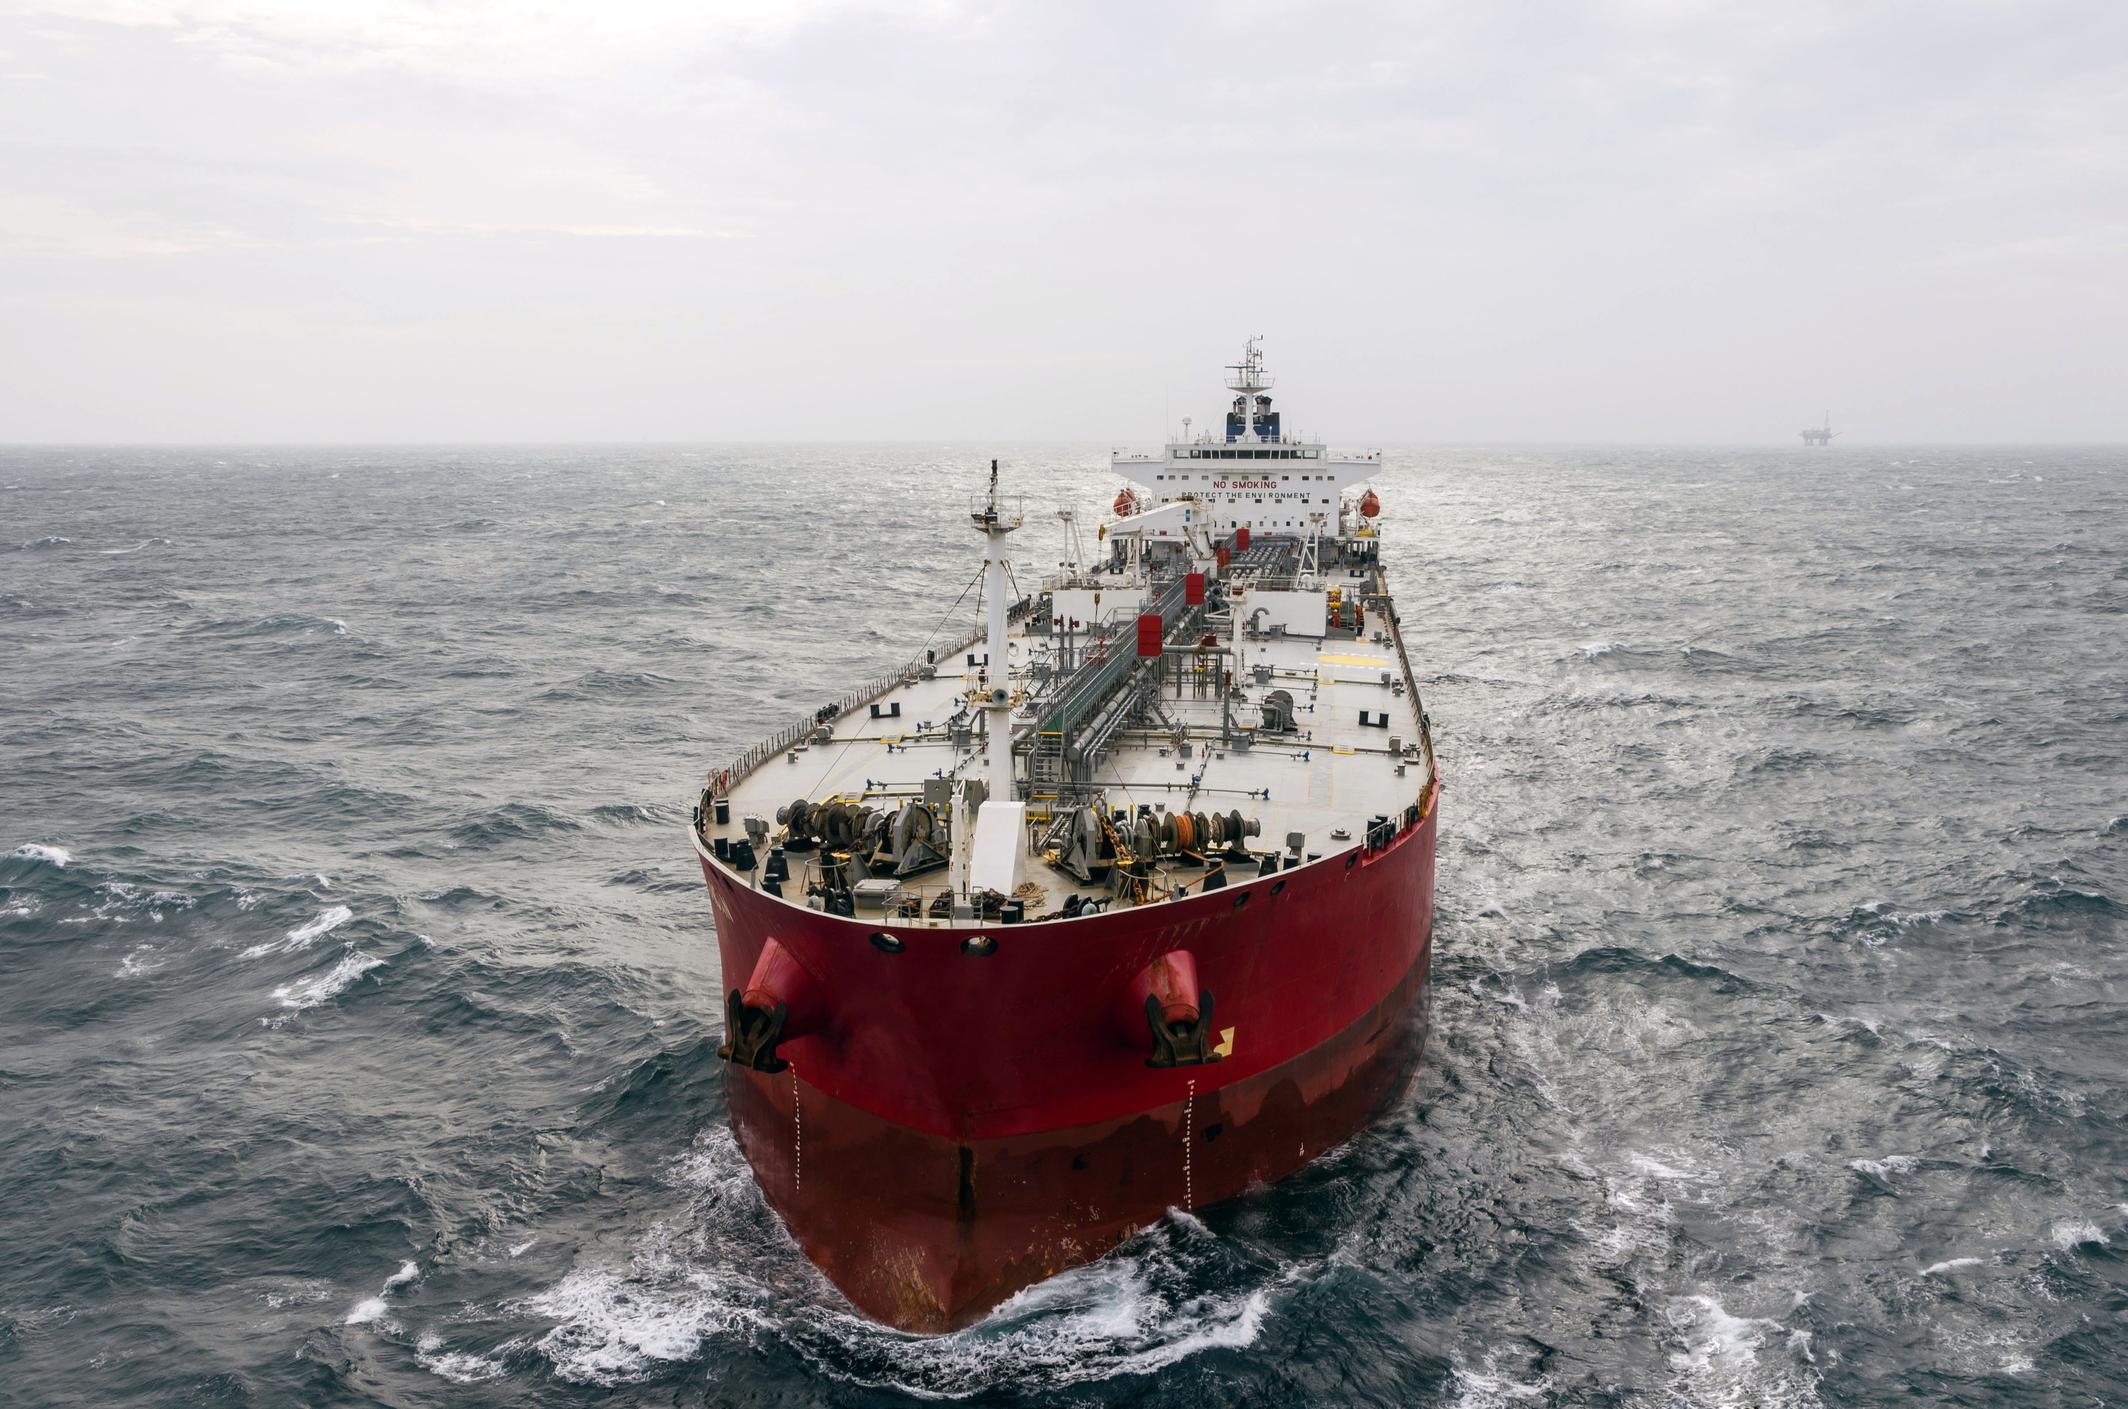 Tanker moving through the seas